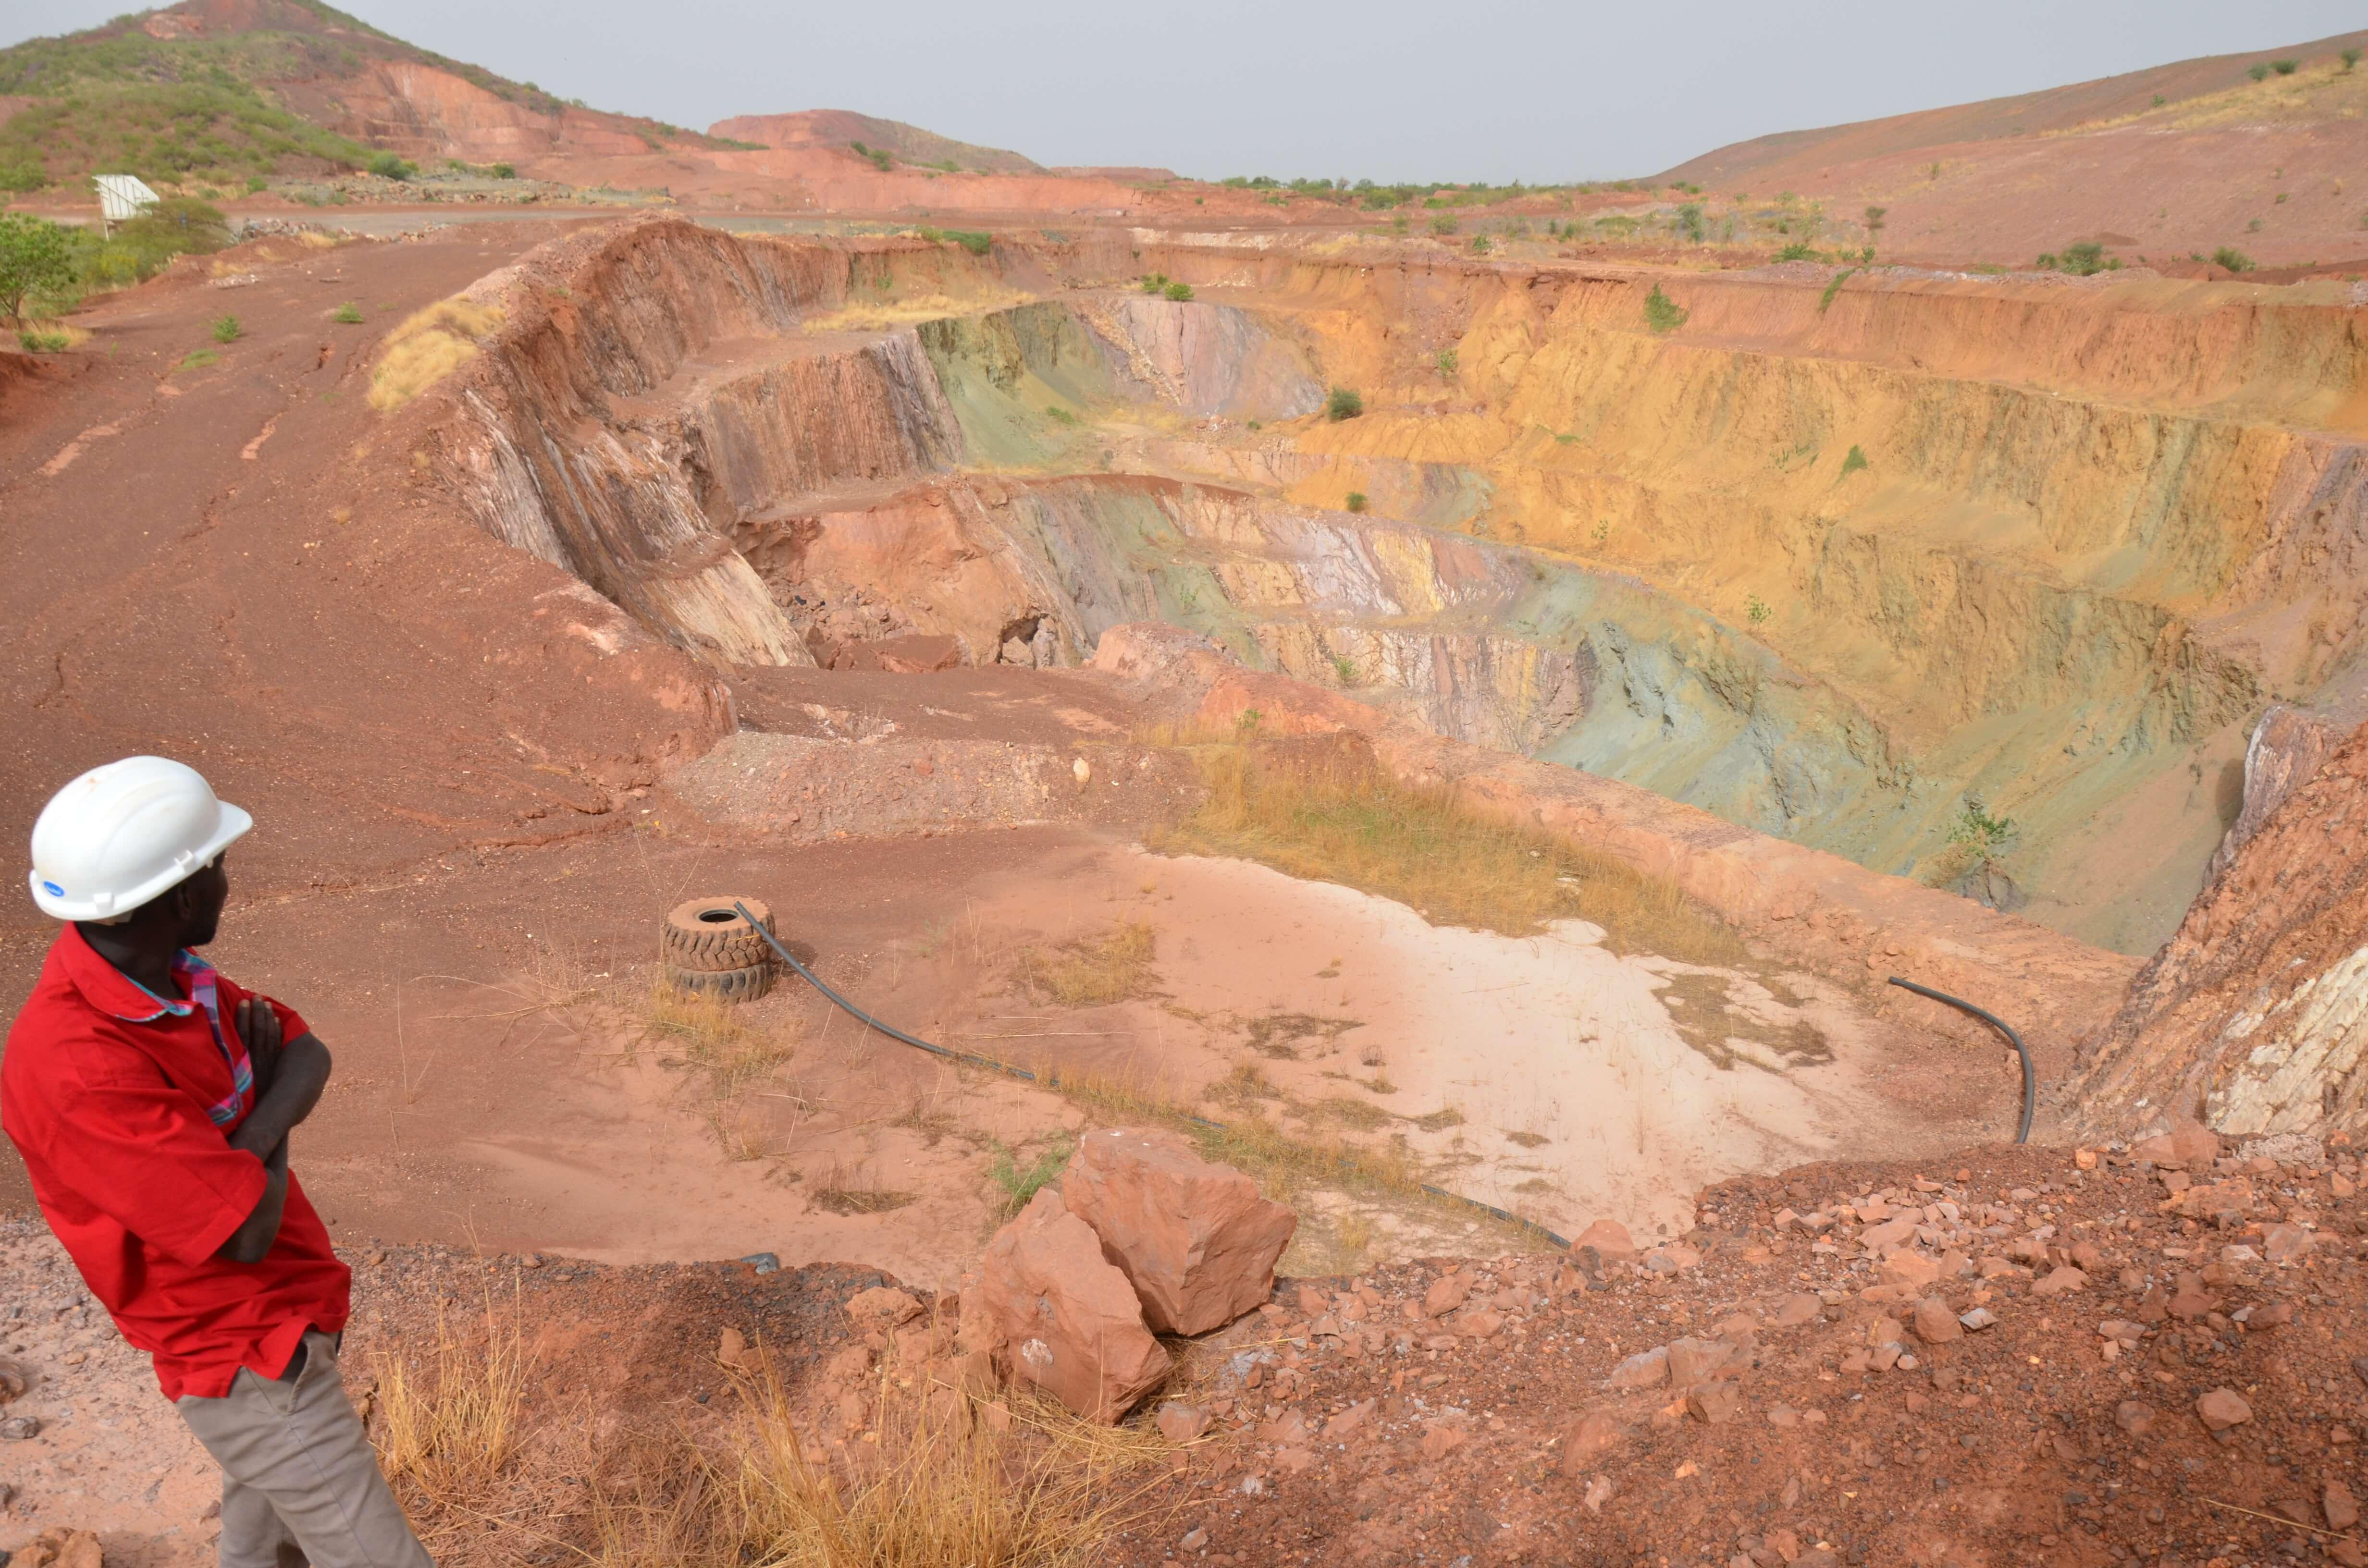 Goldmine Burkina Faso Konzernverantwortungsinitiative